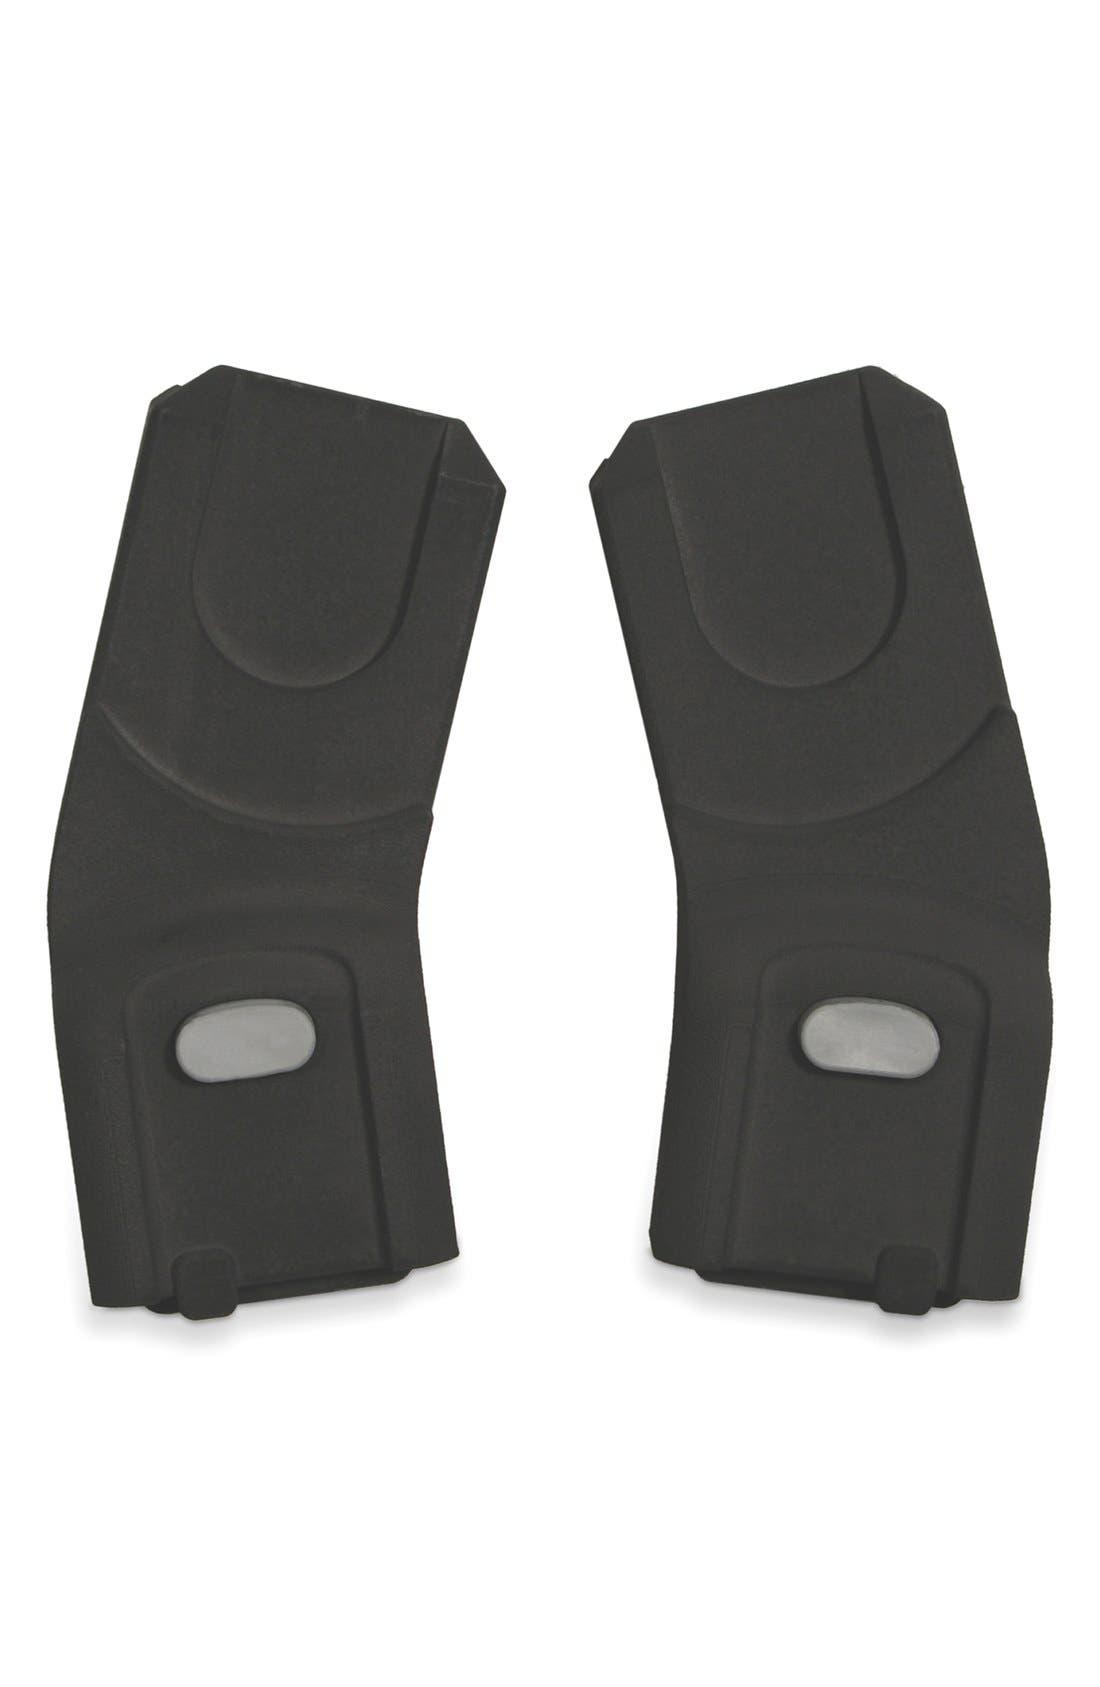 VISTA & CRUZ  Maxi-Cosi<sup>®</sup> Infant Car Seat Adapter,                         Main,                         color, Black